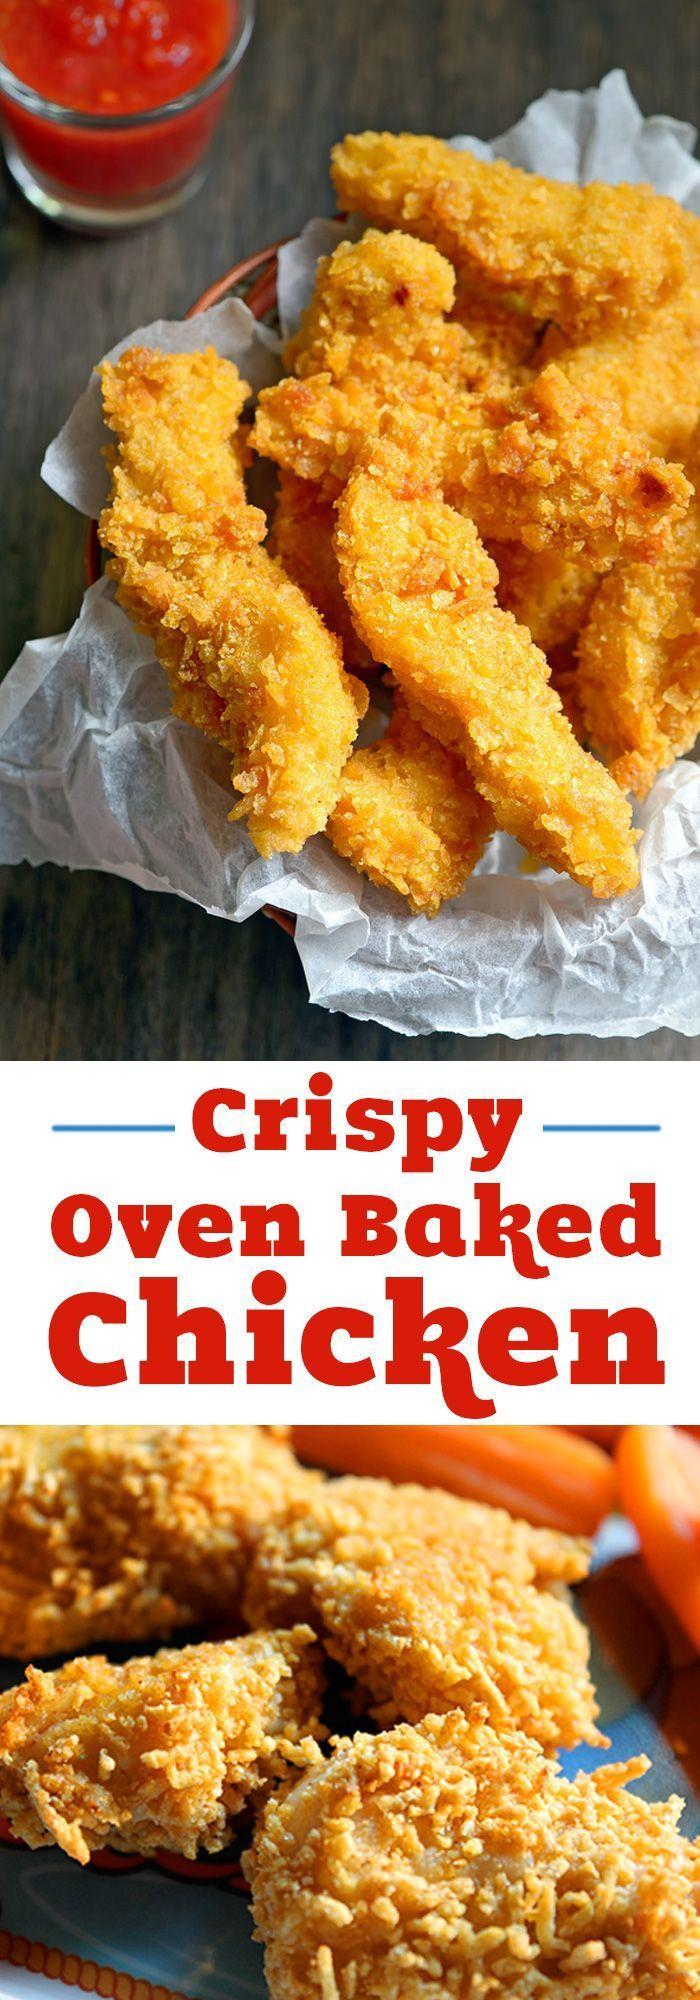 Crispy Oven Fried Chicken Recipe  best DIY Creative Ideas images on Pinterest